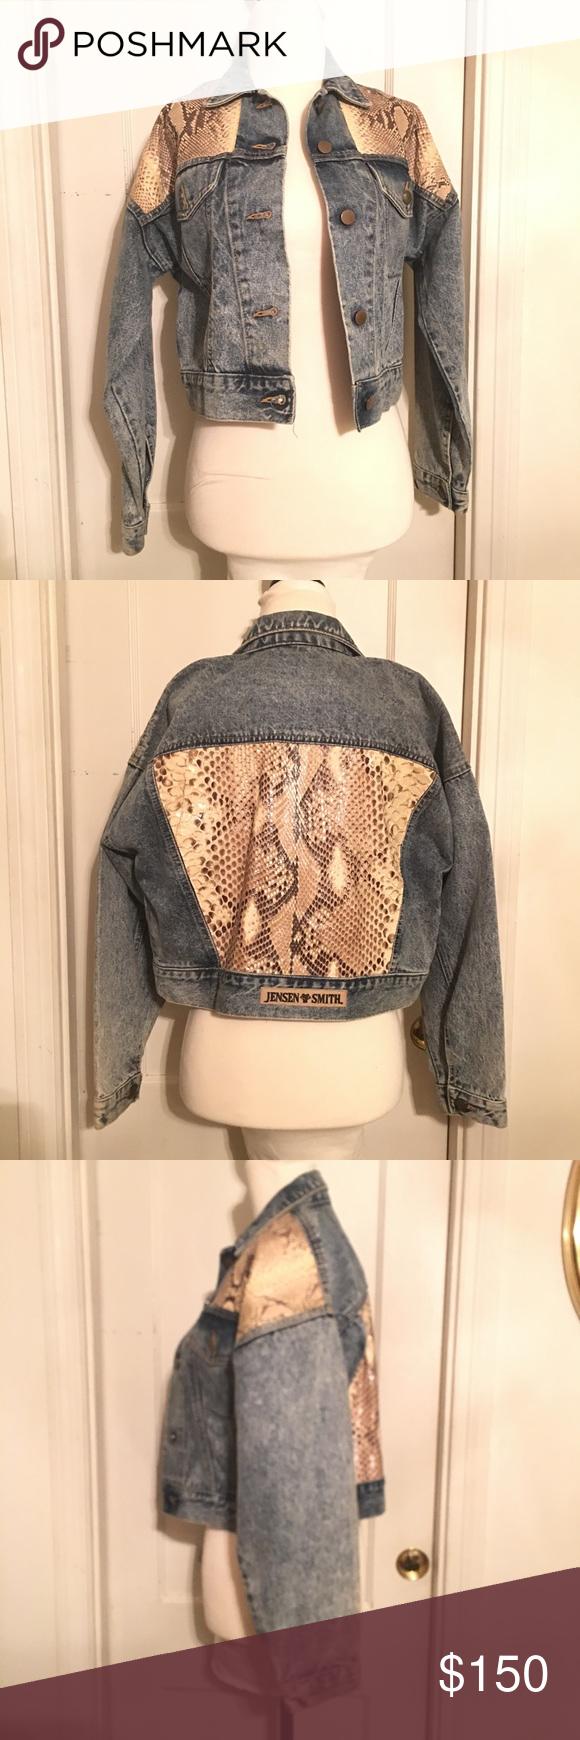 Vintage Genuine Snakeskin Jacket by Jensen Smith Pinterest